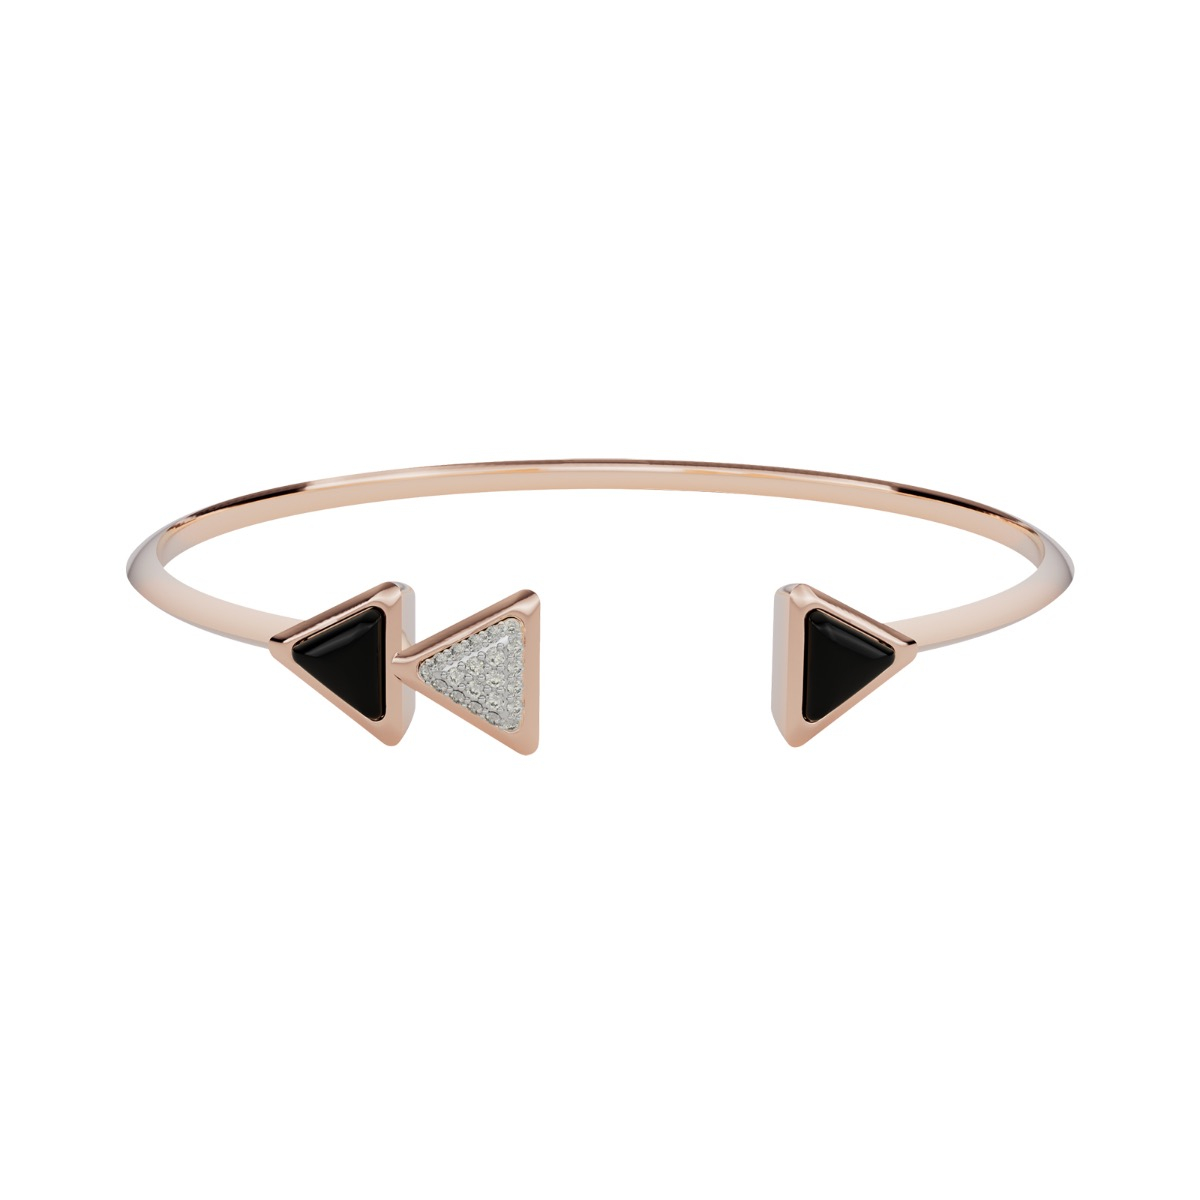 Bracelet Dove Vai Rewind Exquisite Rose Gold Onix and Diamonds